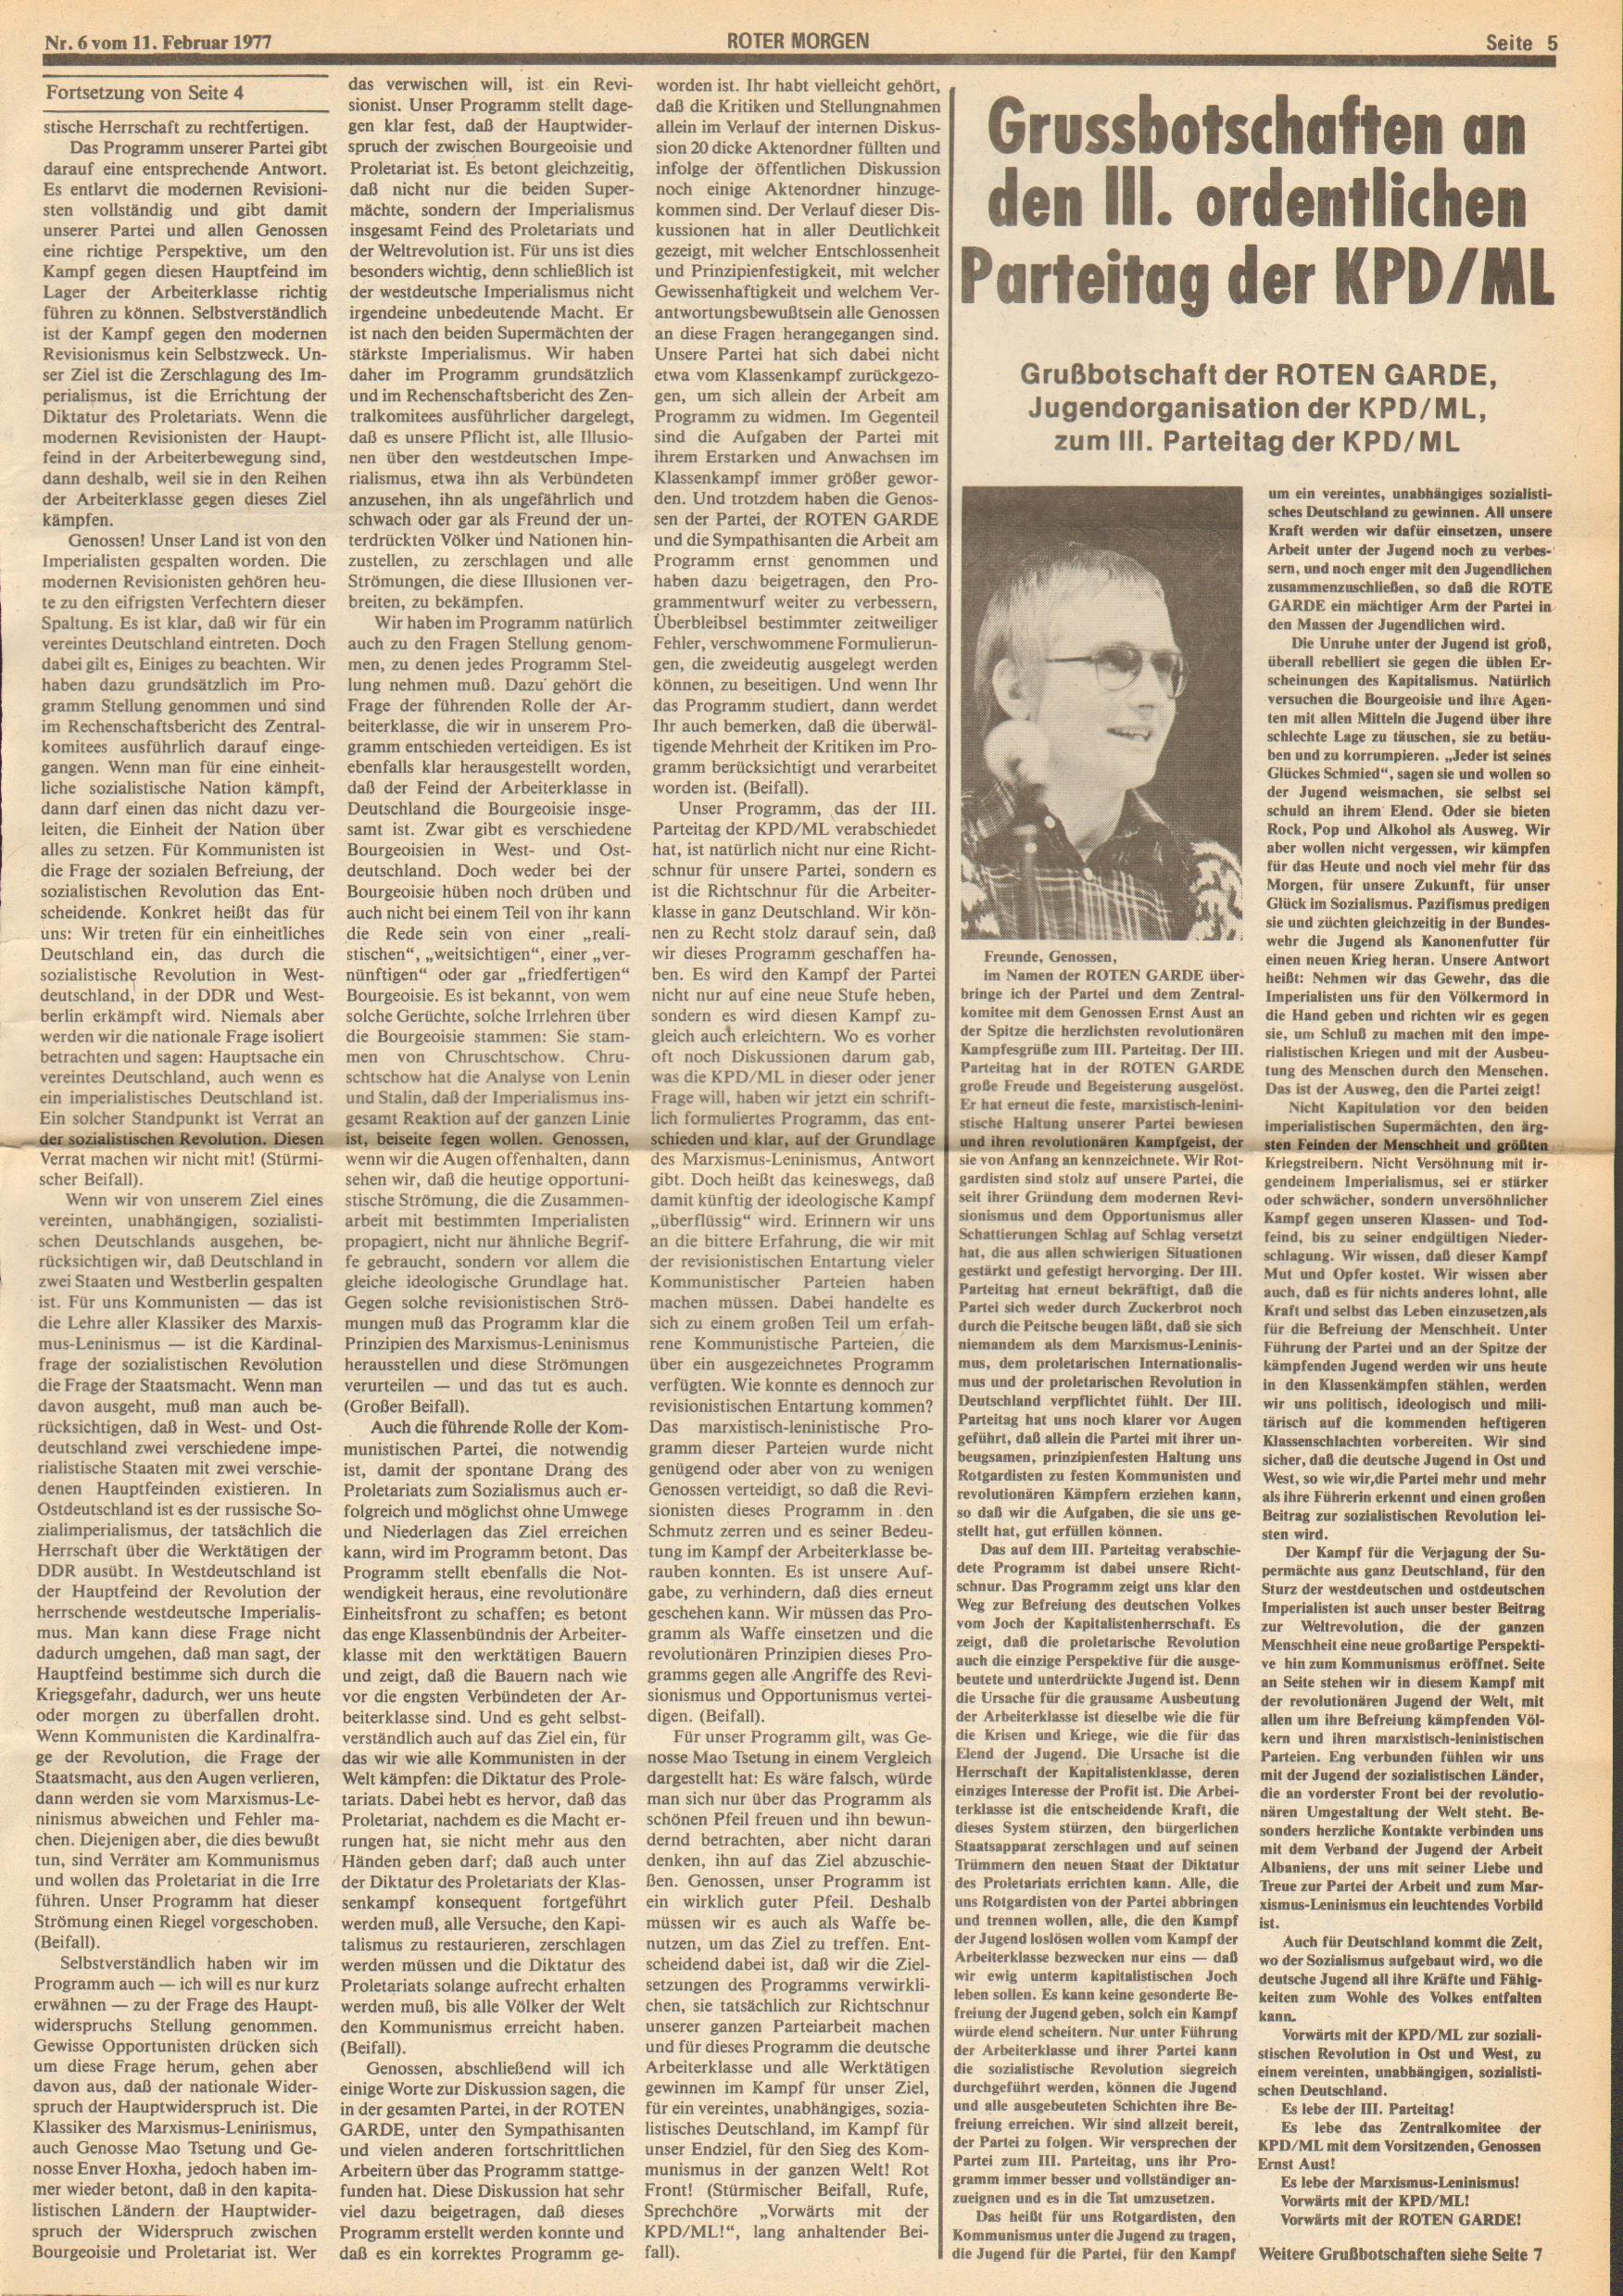 Roter Morgen, 11. Jg., 11. Februar 1977, Nr. 6, Seite 5